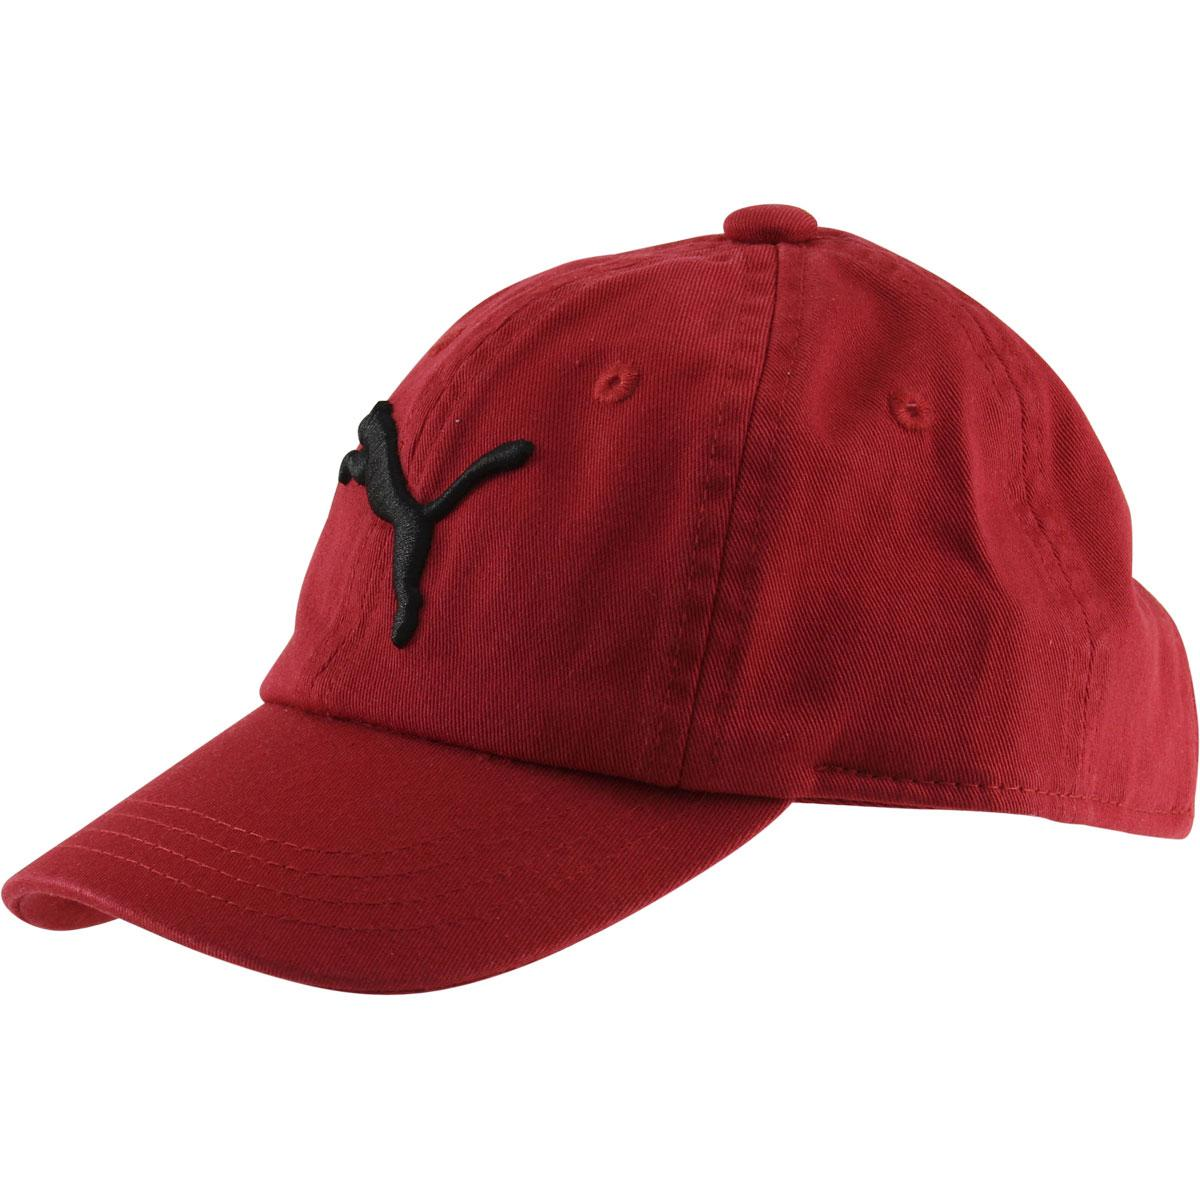 028285c9303 Puma Toddler Boy s Evercat Podium Cotton Baseball Cap Hat